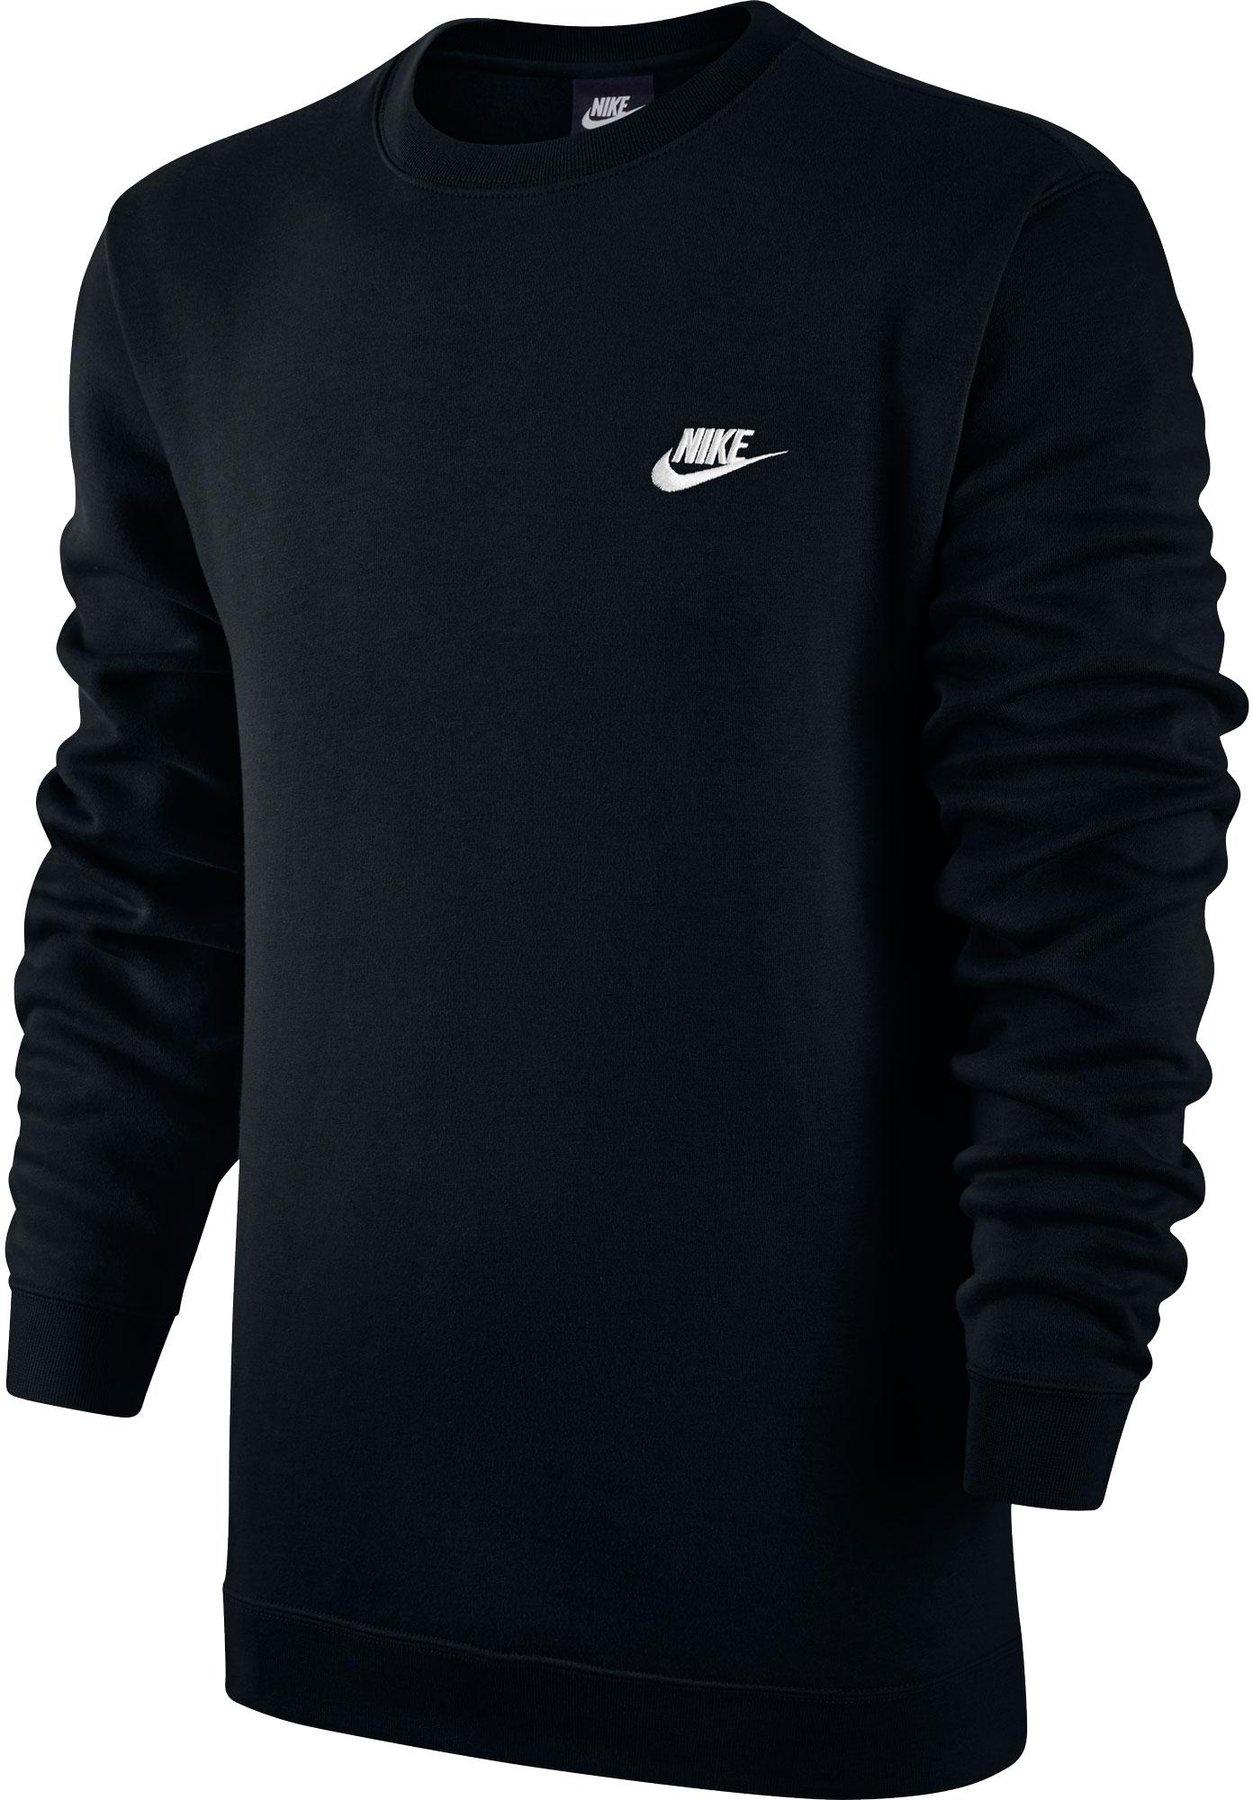 buy popular ccac3 0379e Nike-Pullover Herren